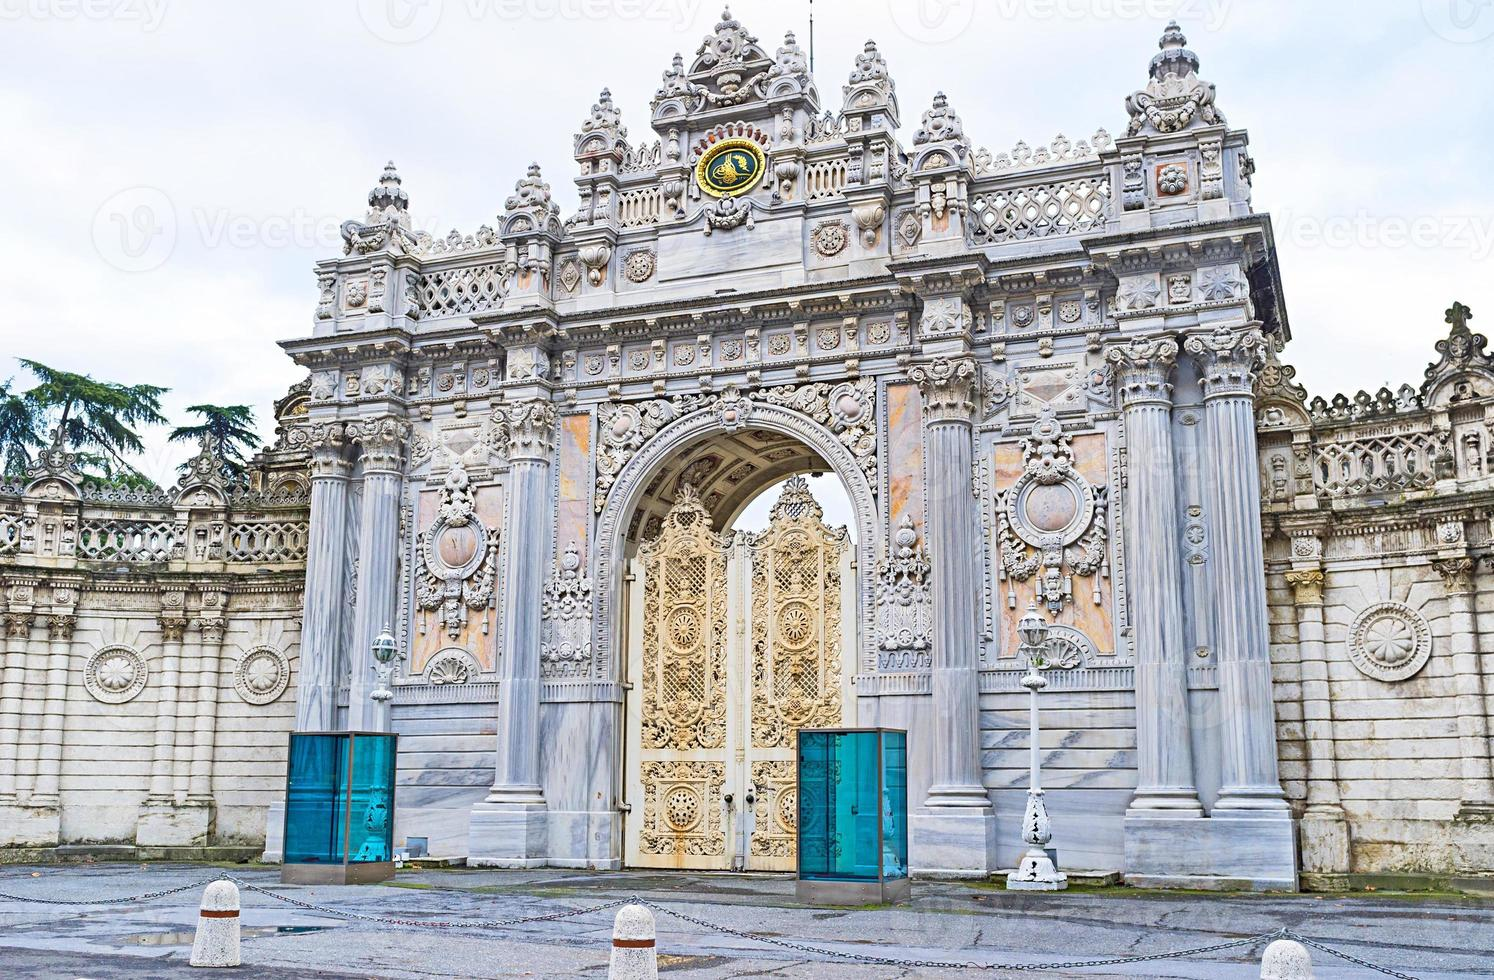 den natursköna porten foto